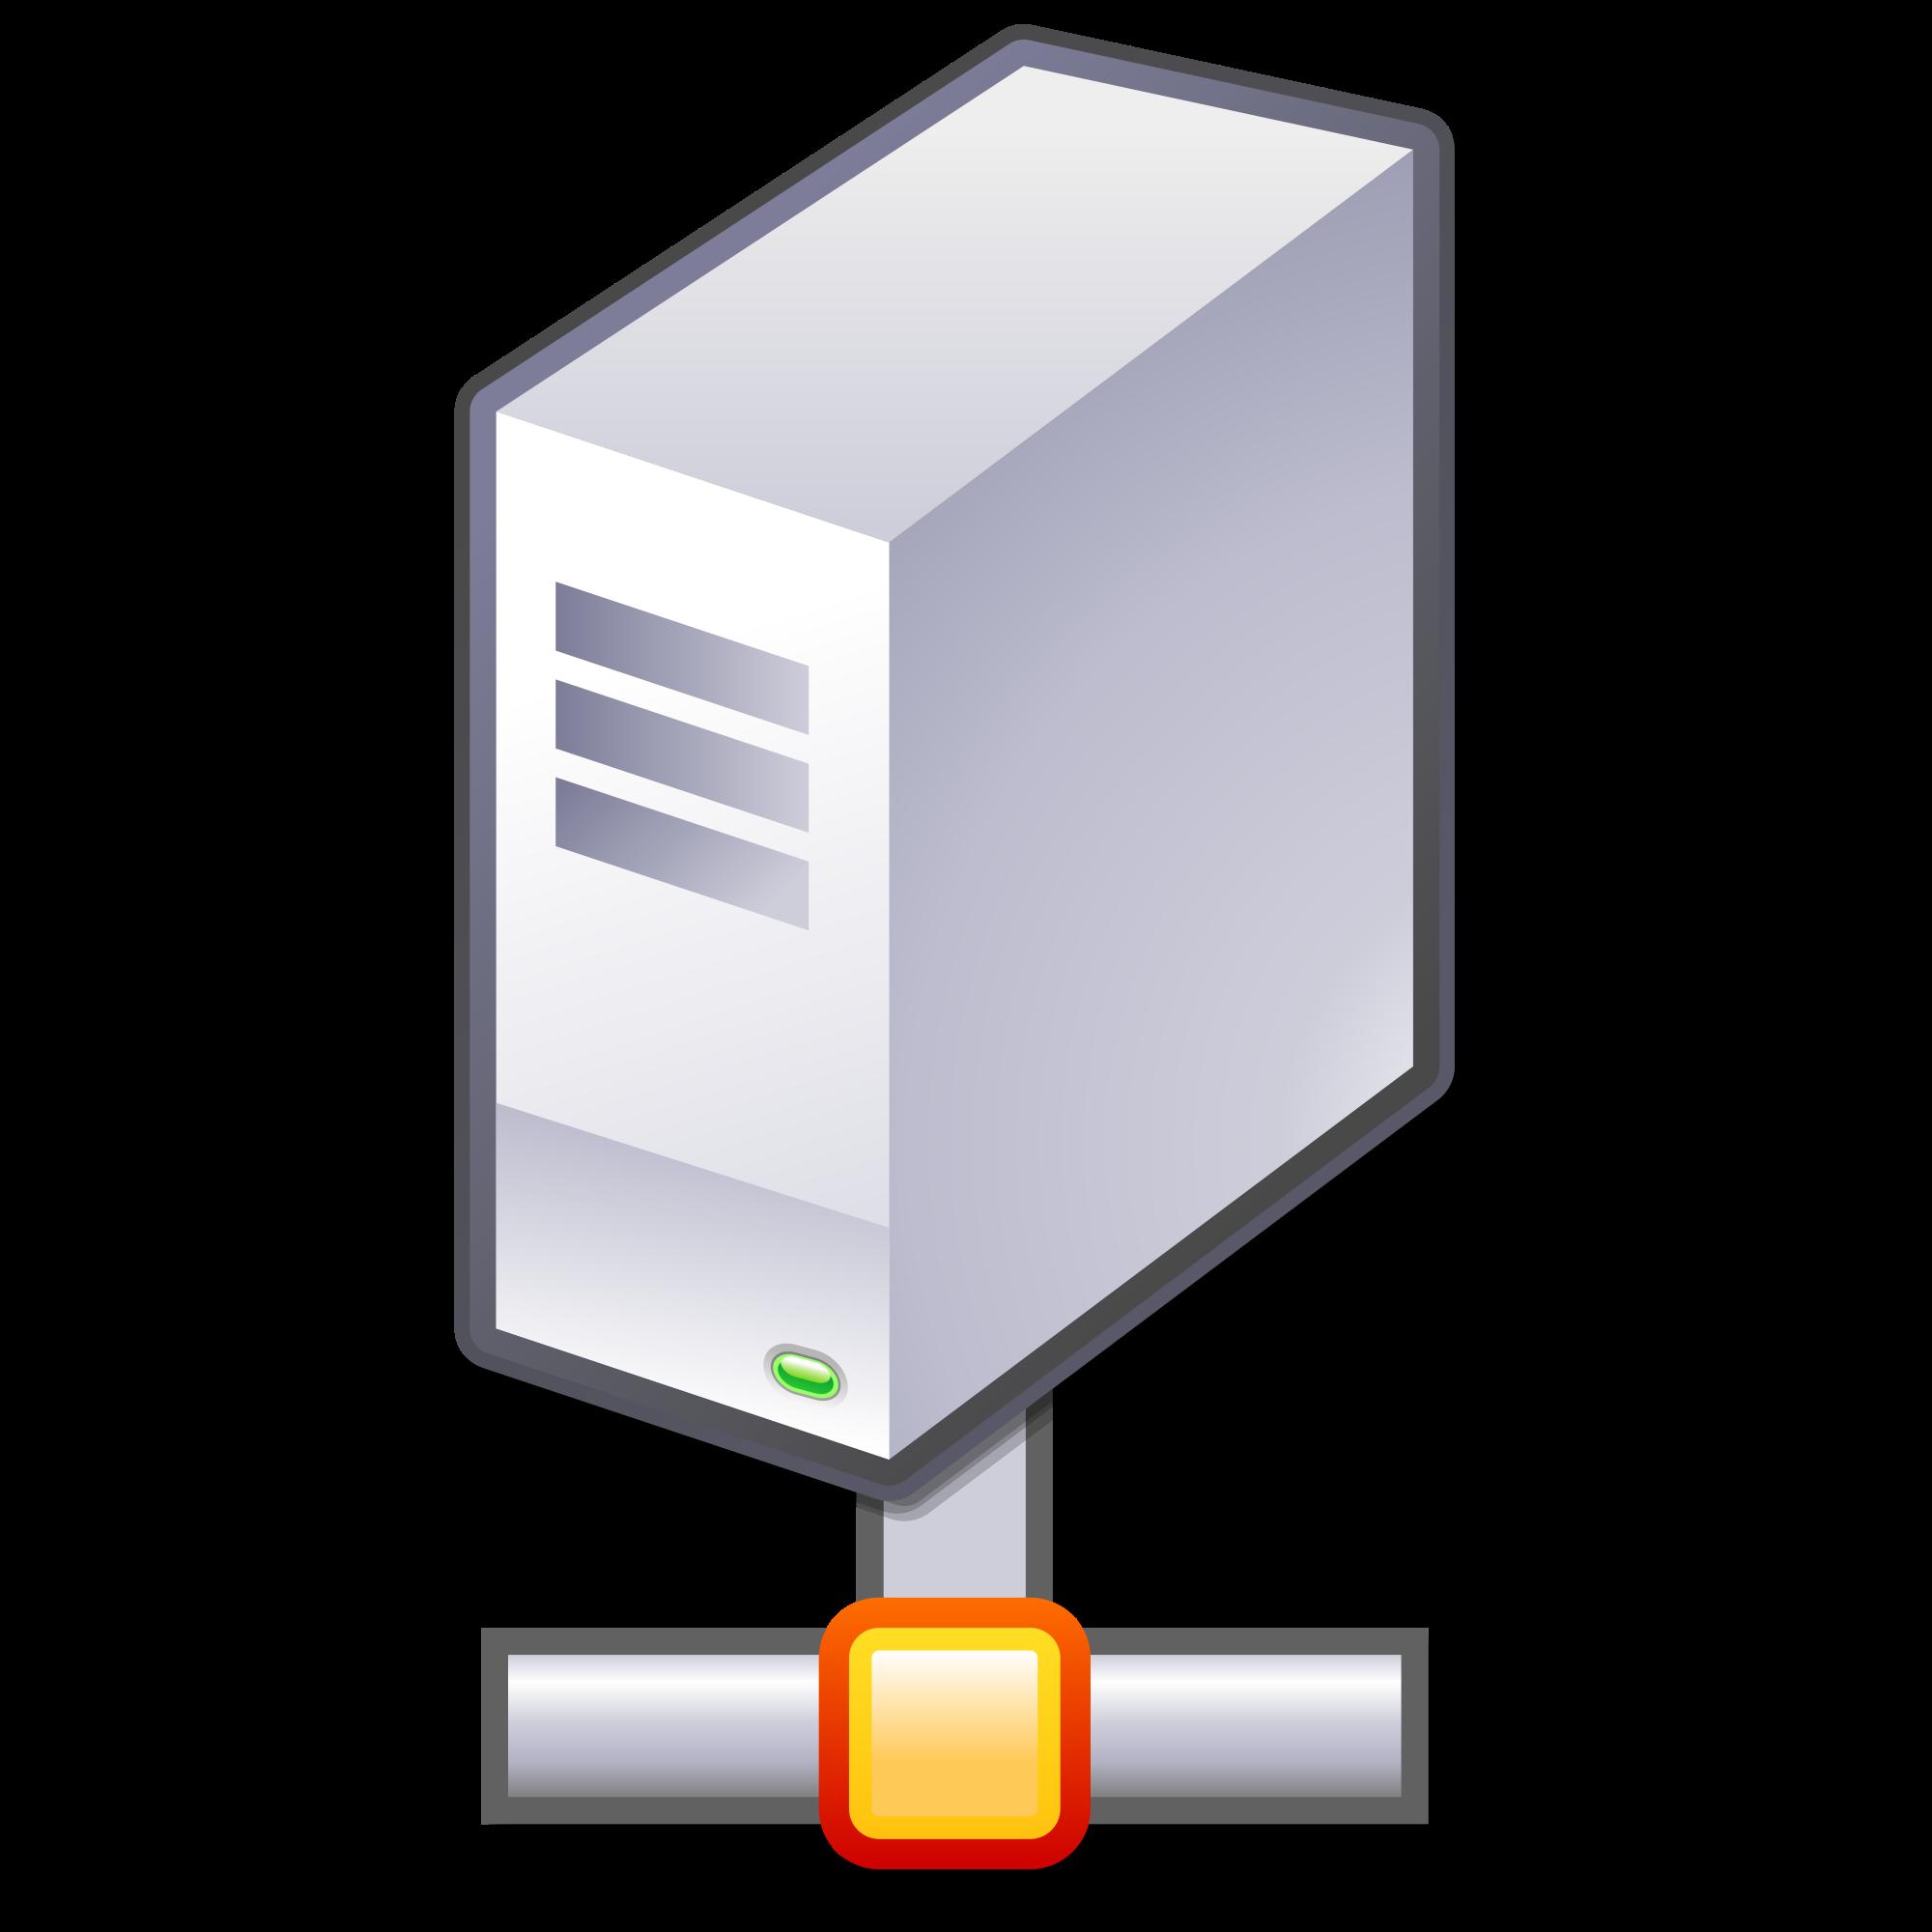 Server PNG - 10465